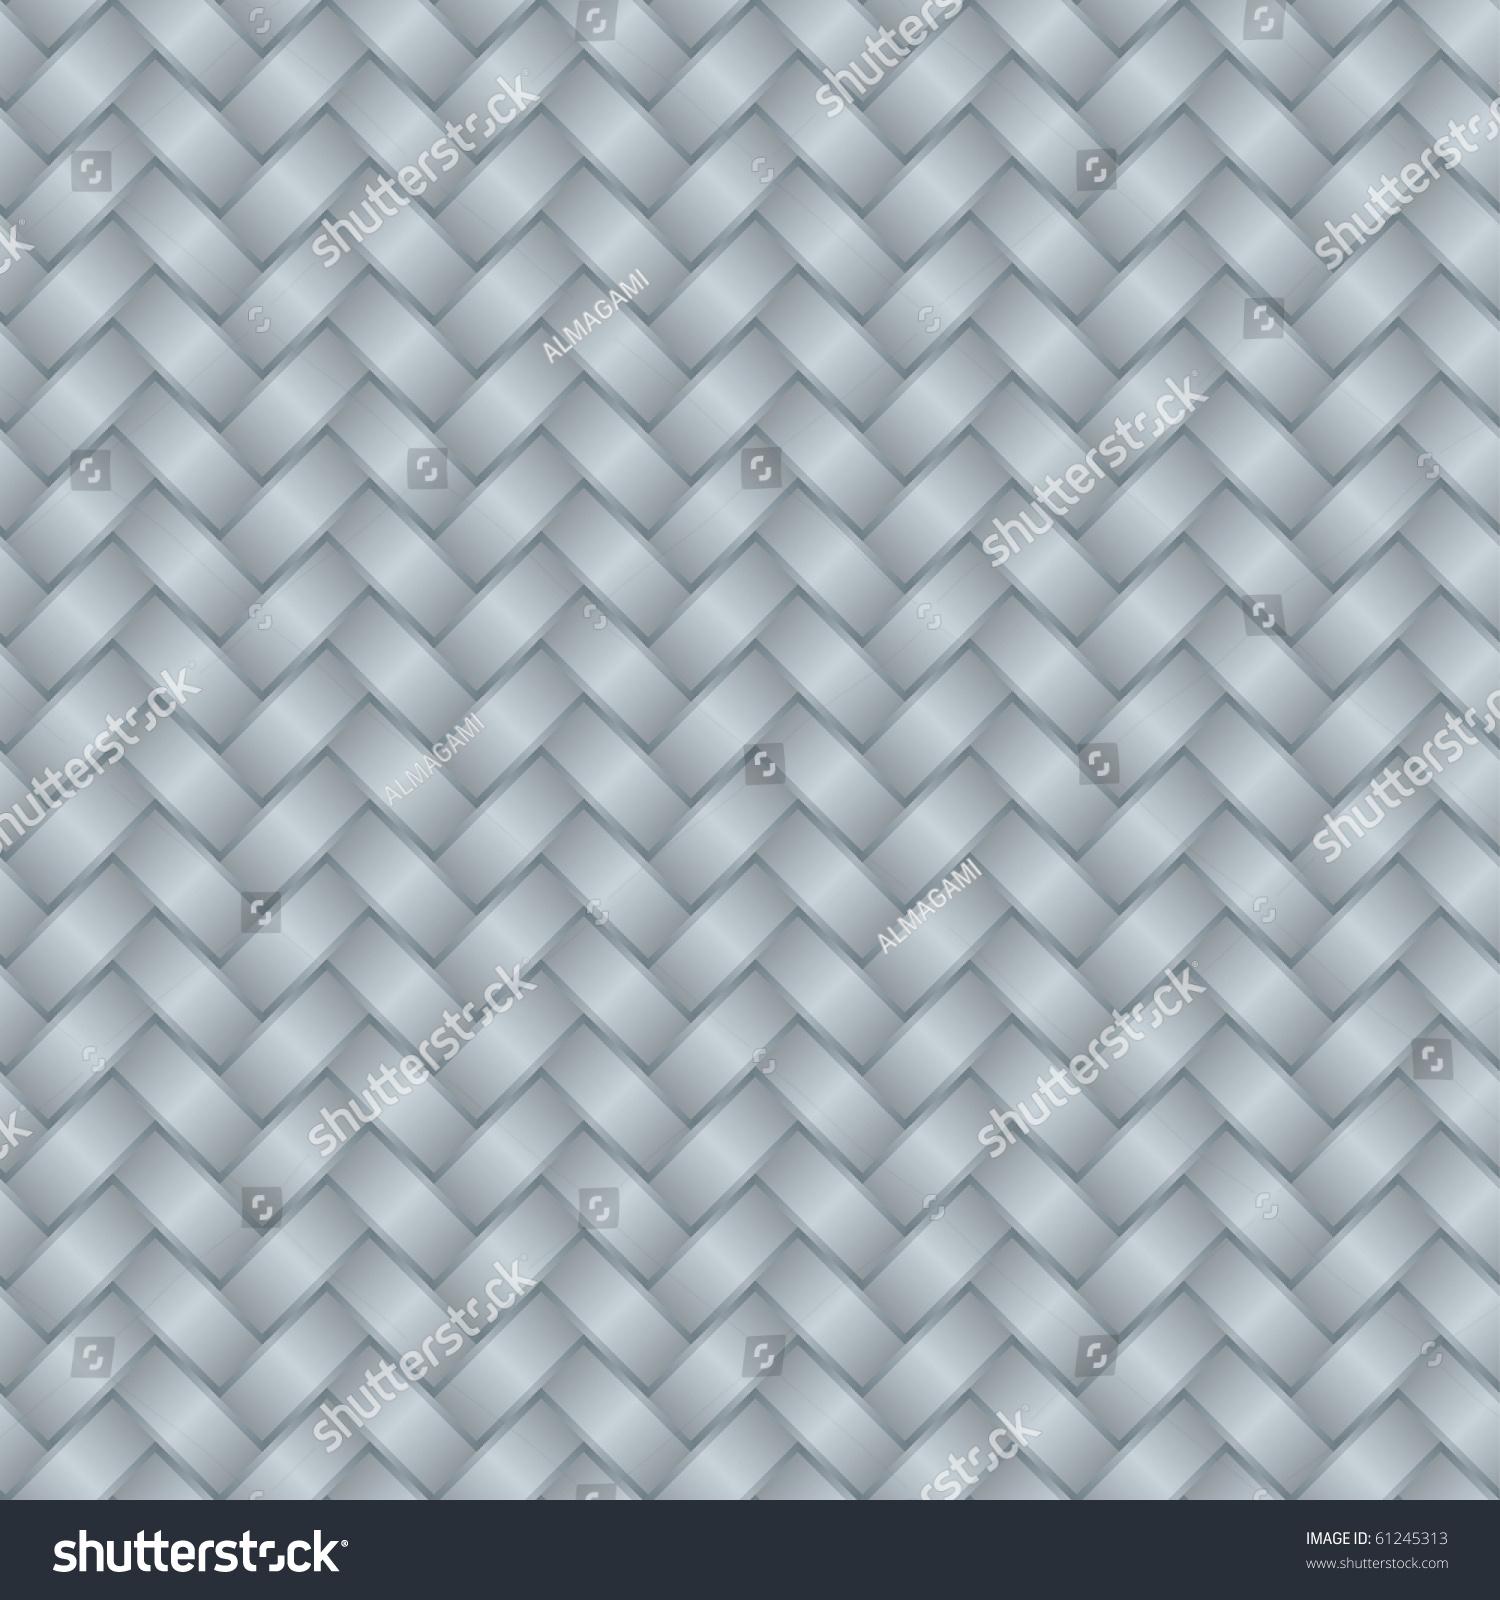 Light Bluegray Satin Background Editable Seamless Stock